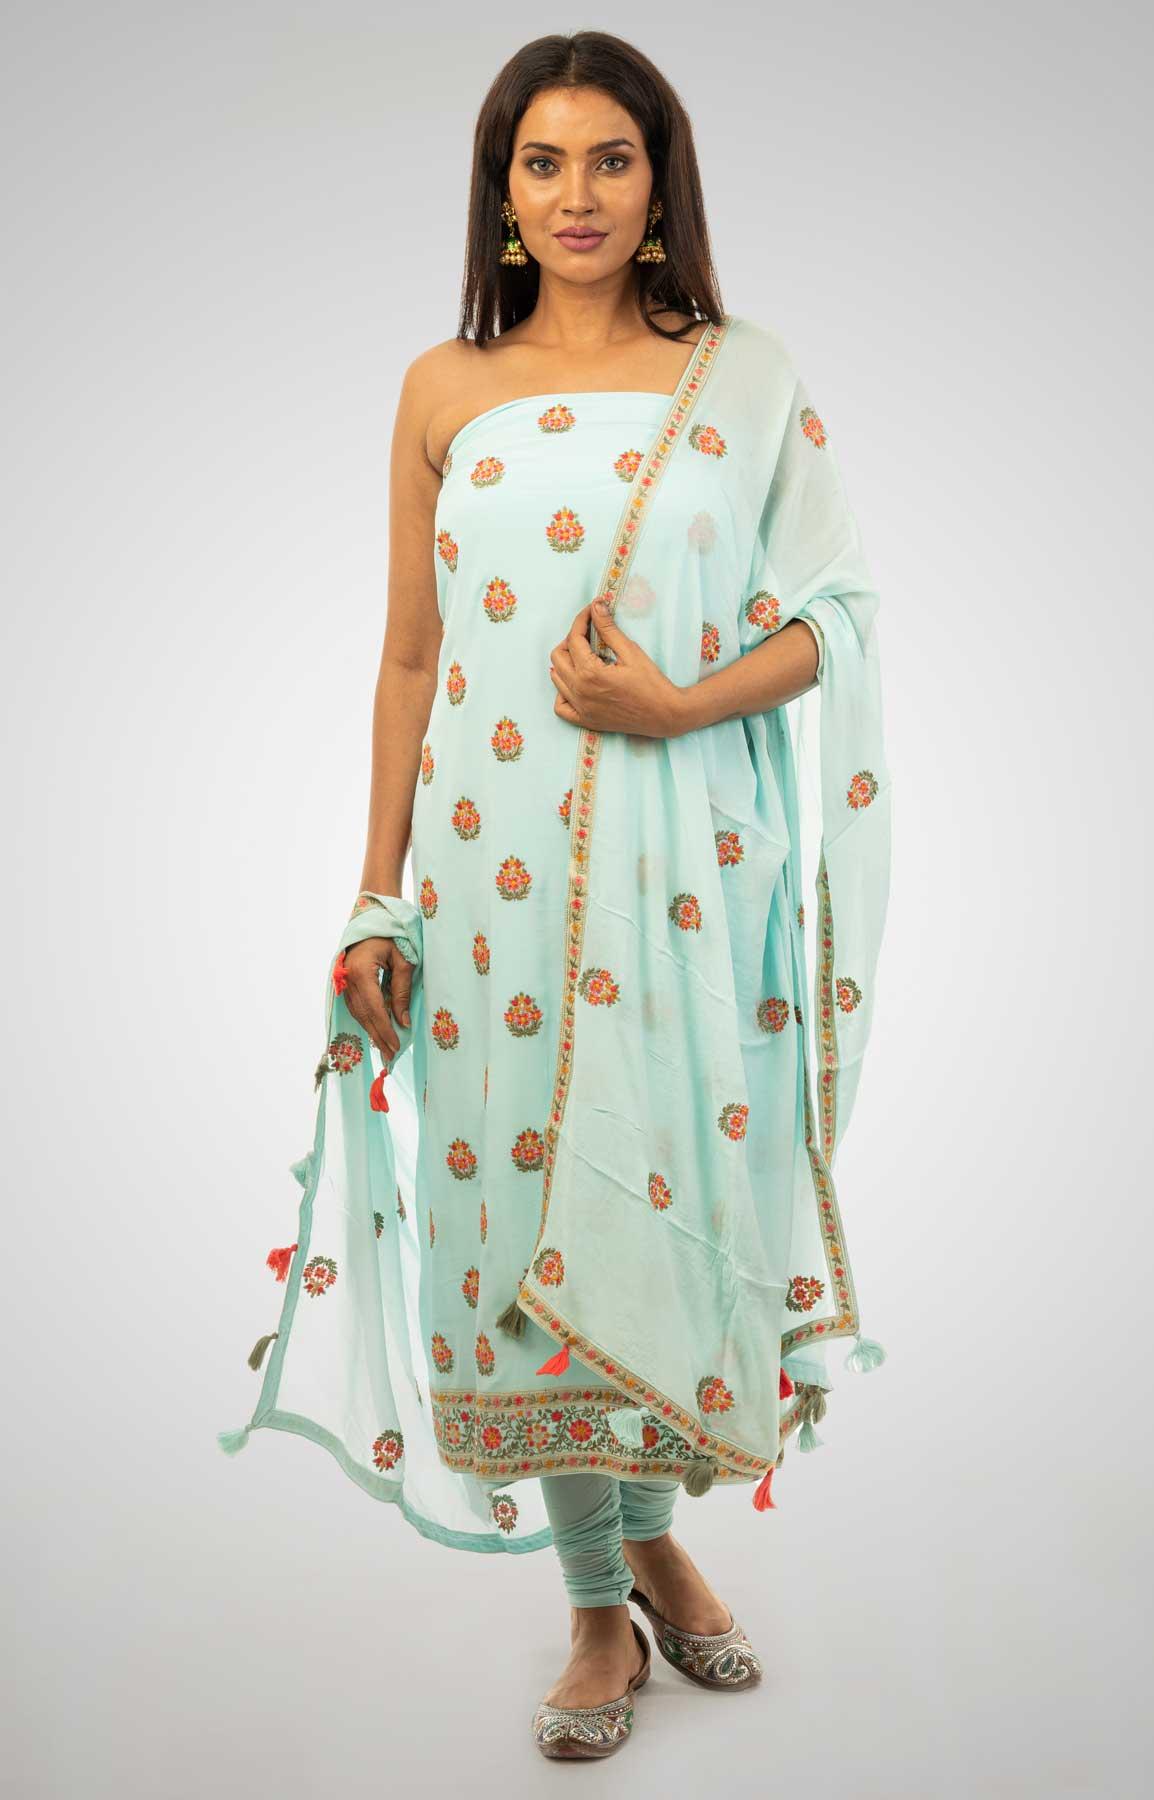 Turquoise Crepe Unstitched Suit With Multi Coloured Resham Work – Viraaya By Ushnakmals